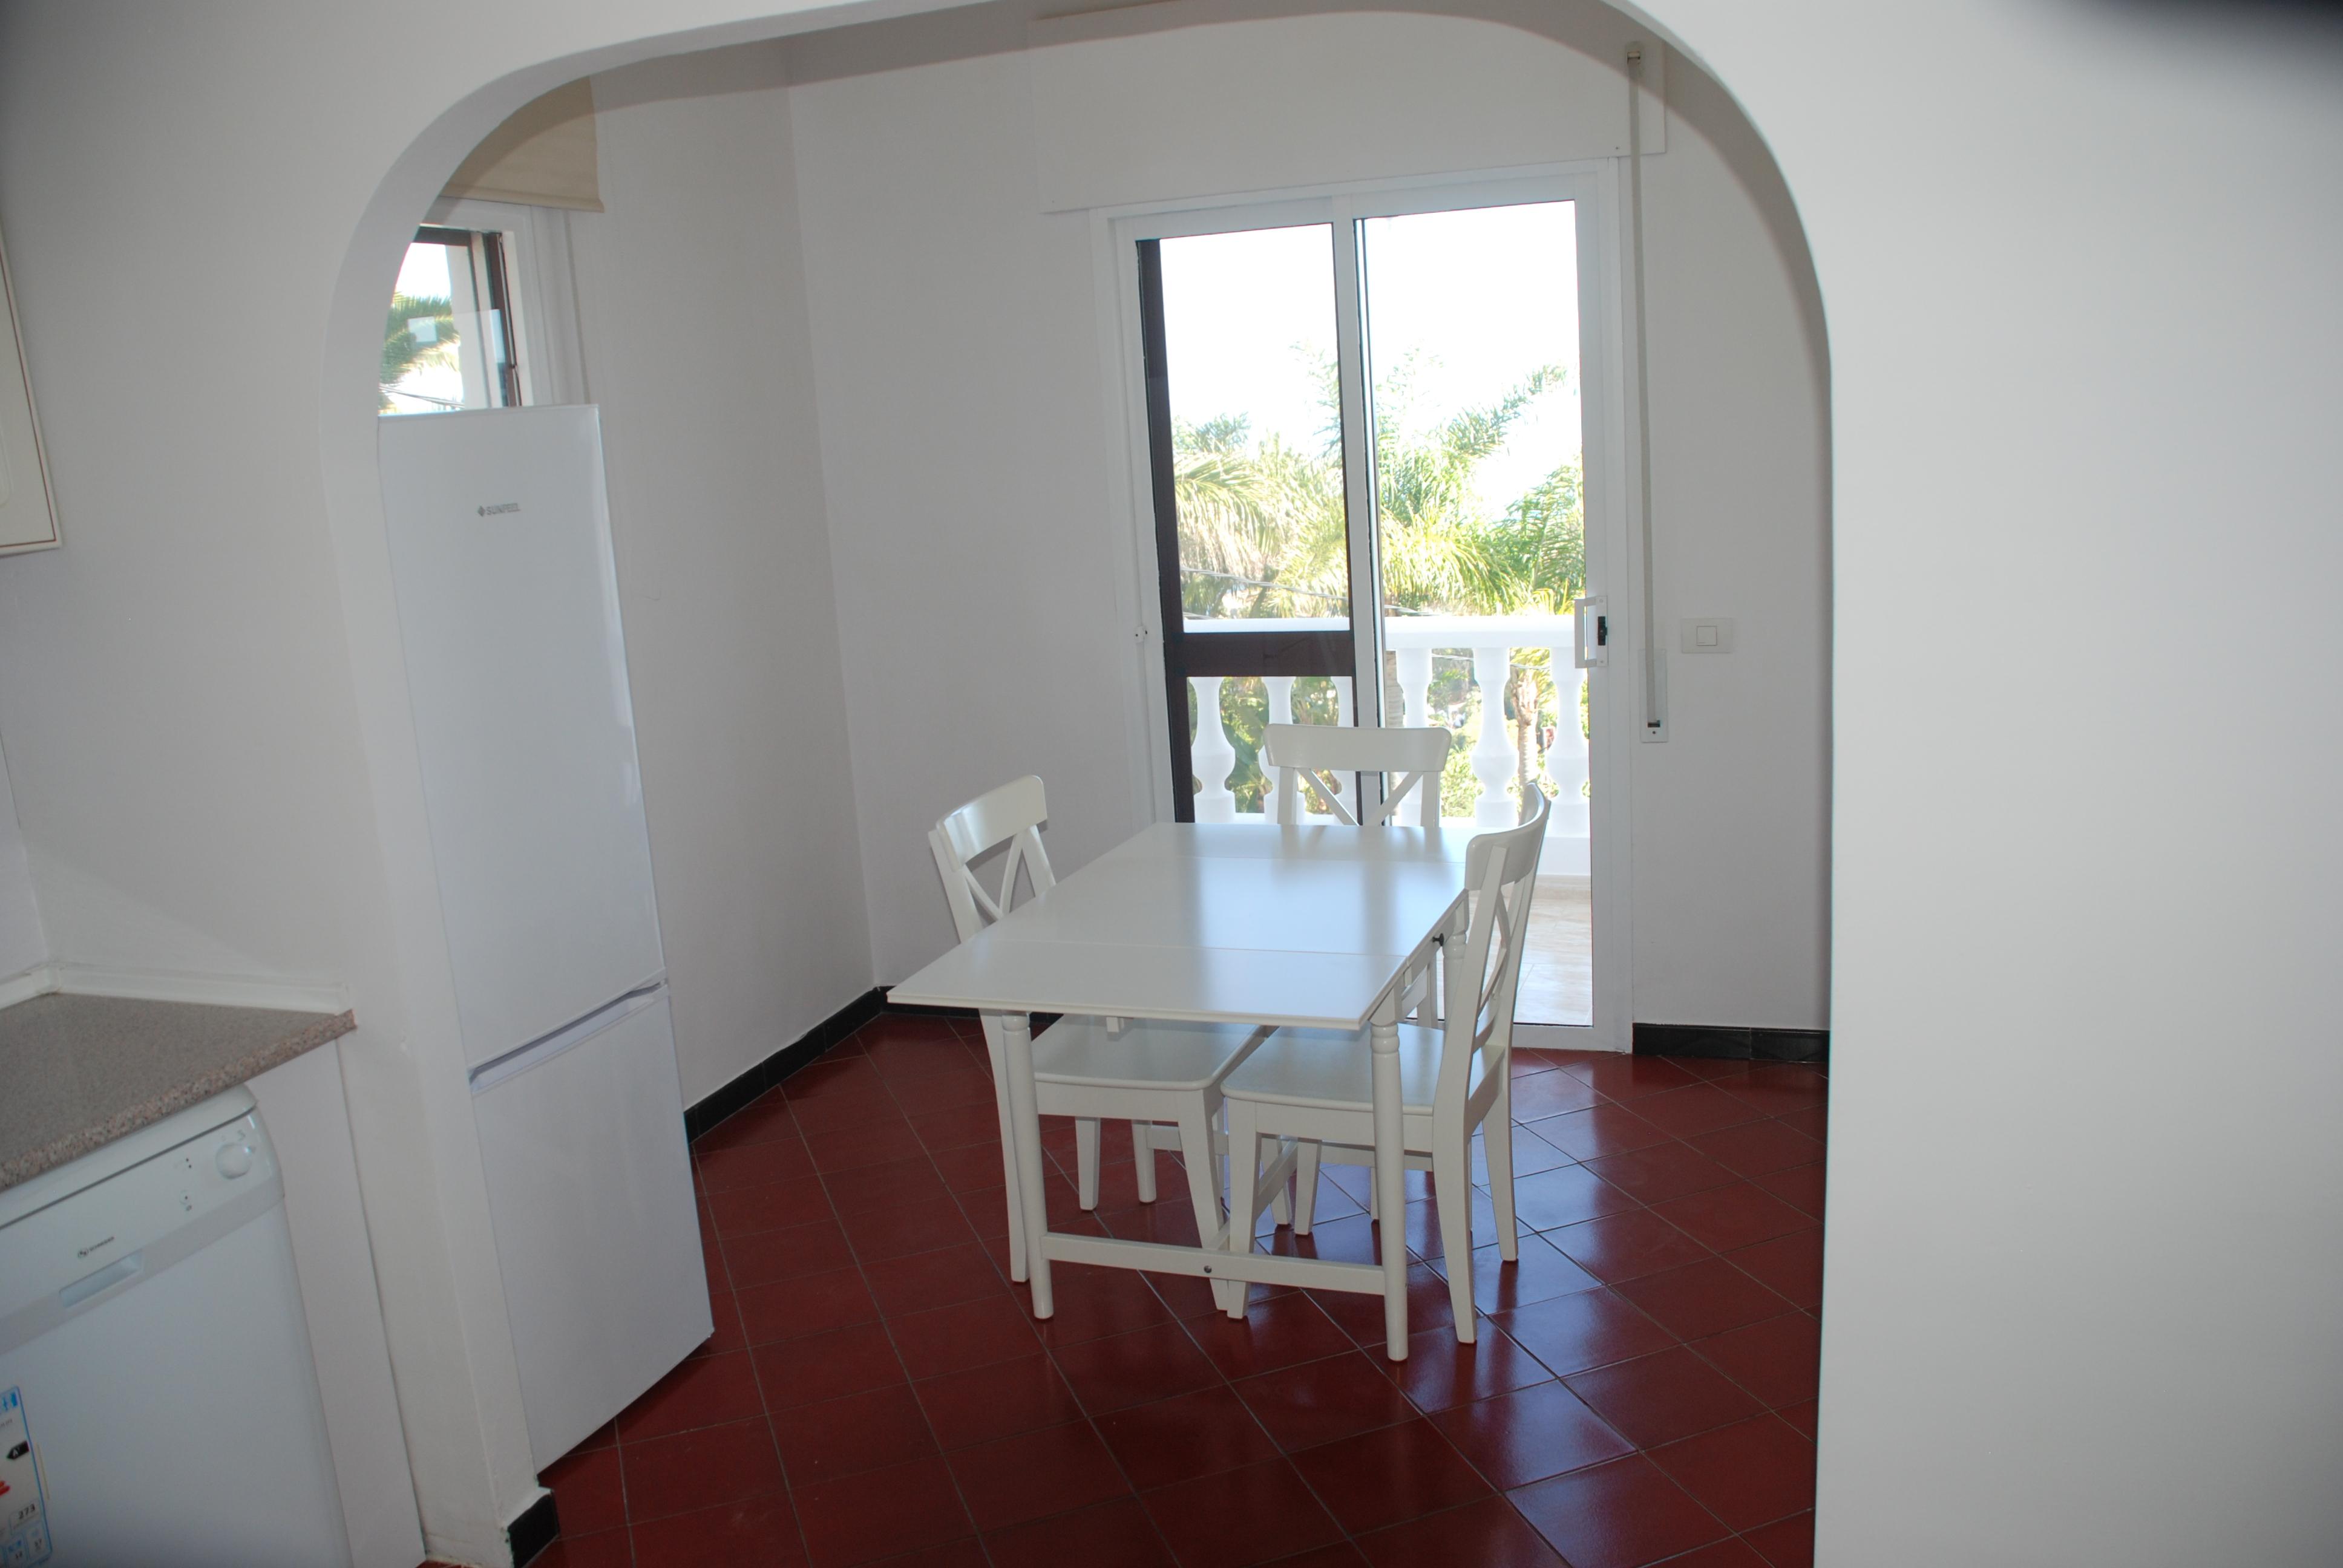 Maison de vacances Villa Vista La Quinta beheizbarer Pool kostenloses WLAN Grill (2124407), Santa Ursula, Ténérife, Iles Canaries, Espagne, image 58